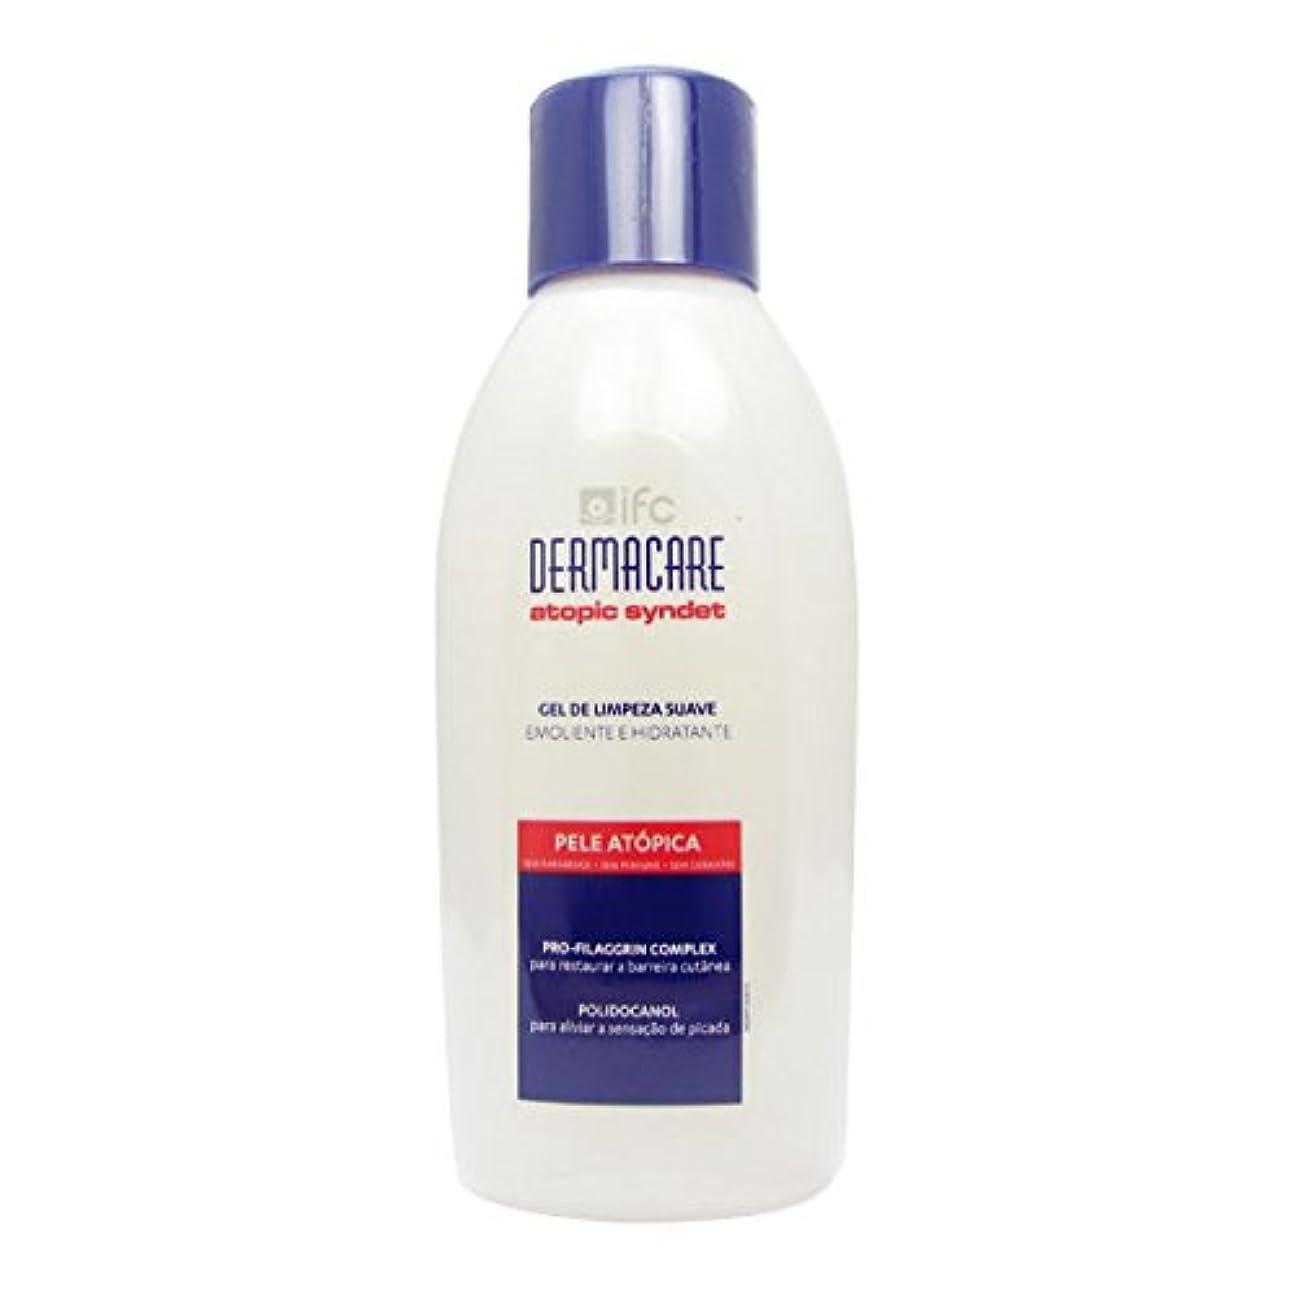 Dermacare Atopic Cleansing Gel 750ml [並行輸入品]